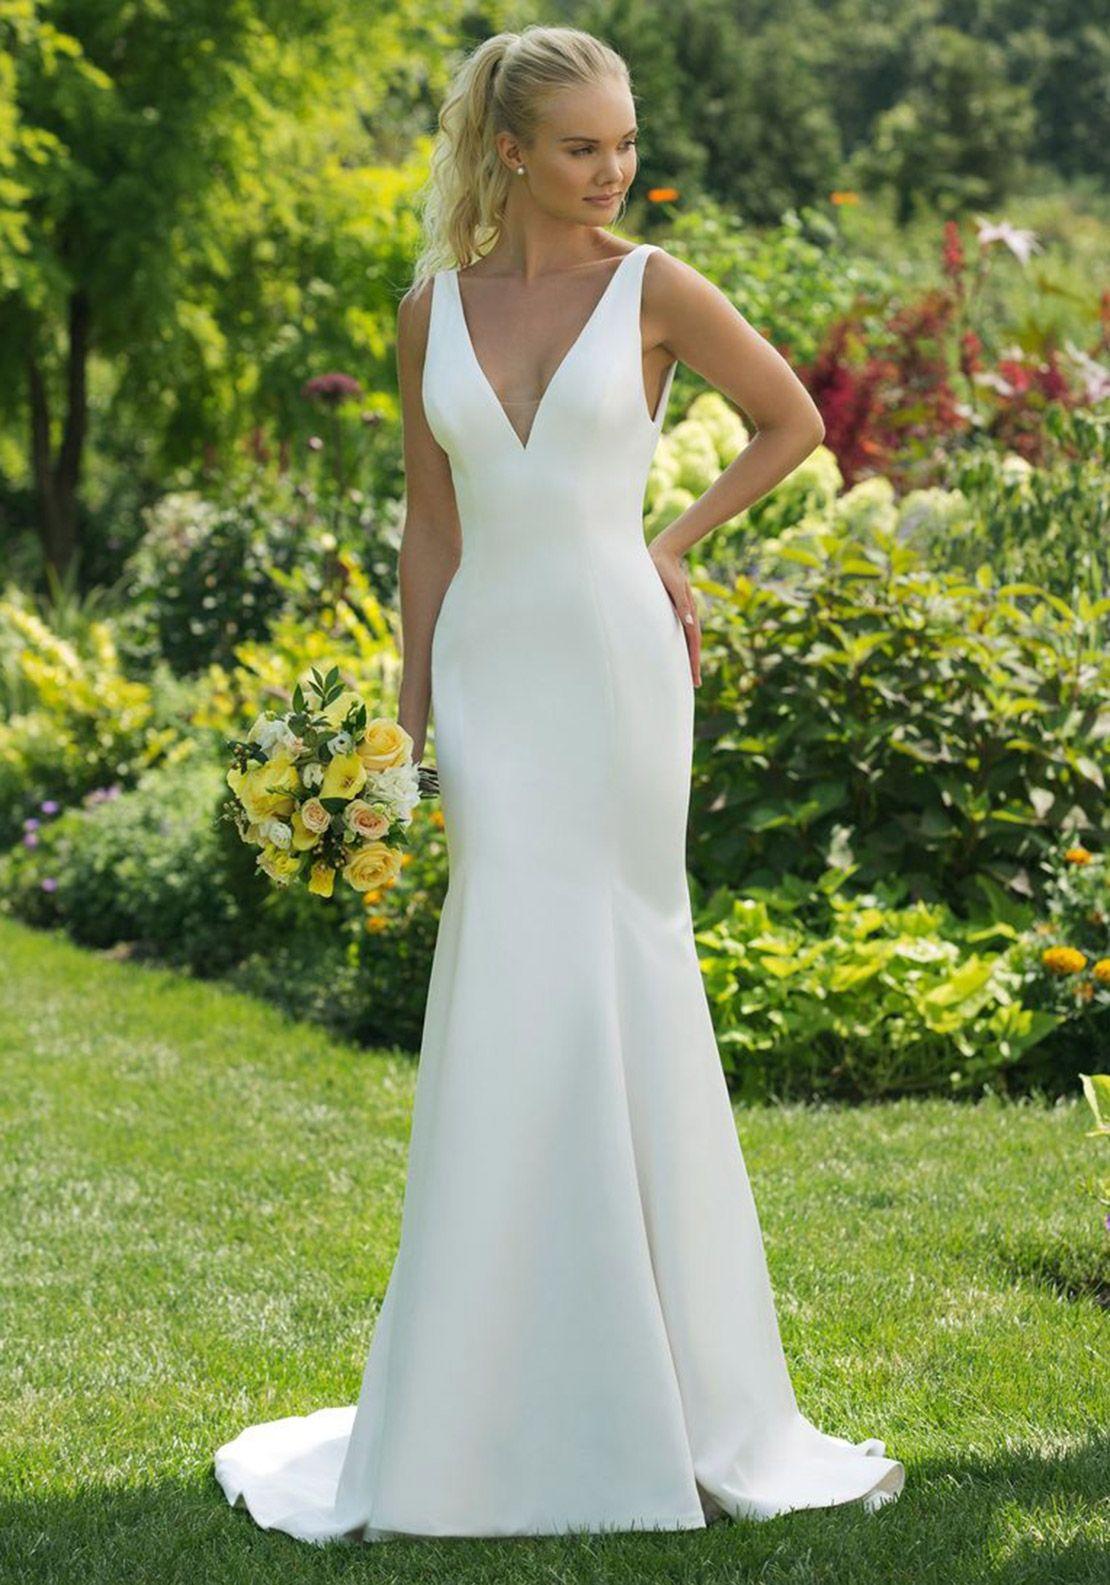 Sweetheart wedding dress in wedding general pinterest